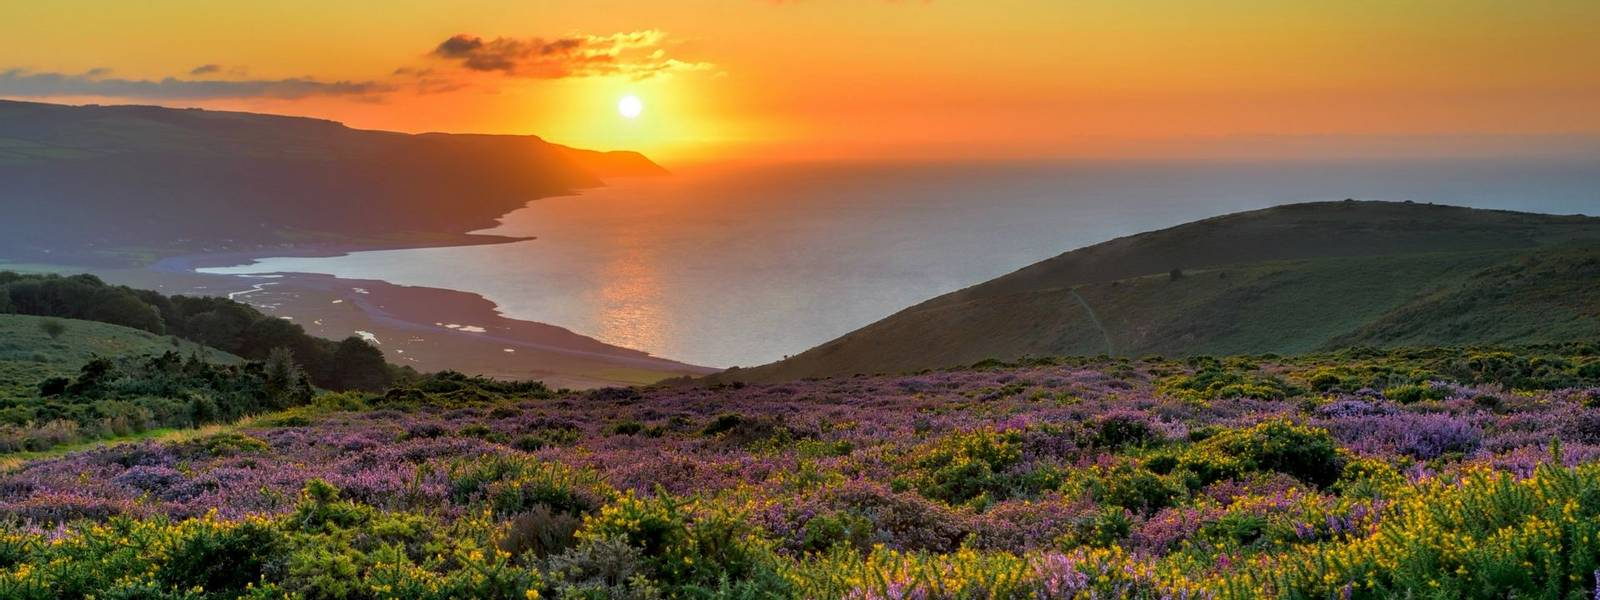 Sunset over Porlock Bay, Exmoor, England